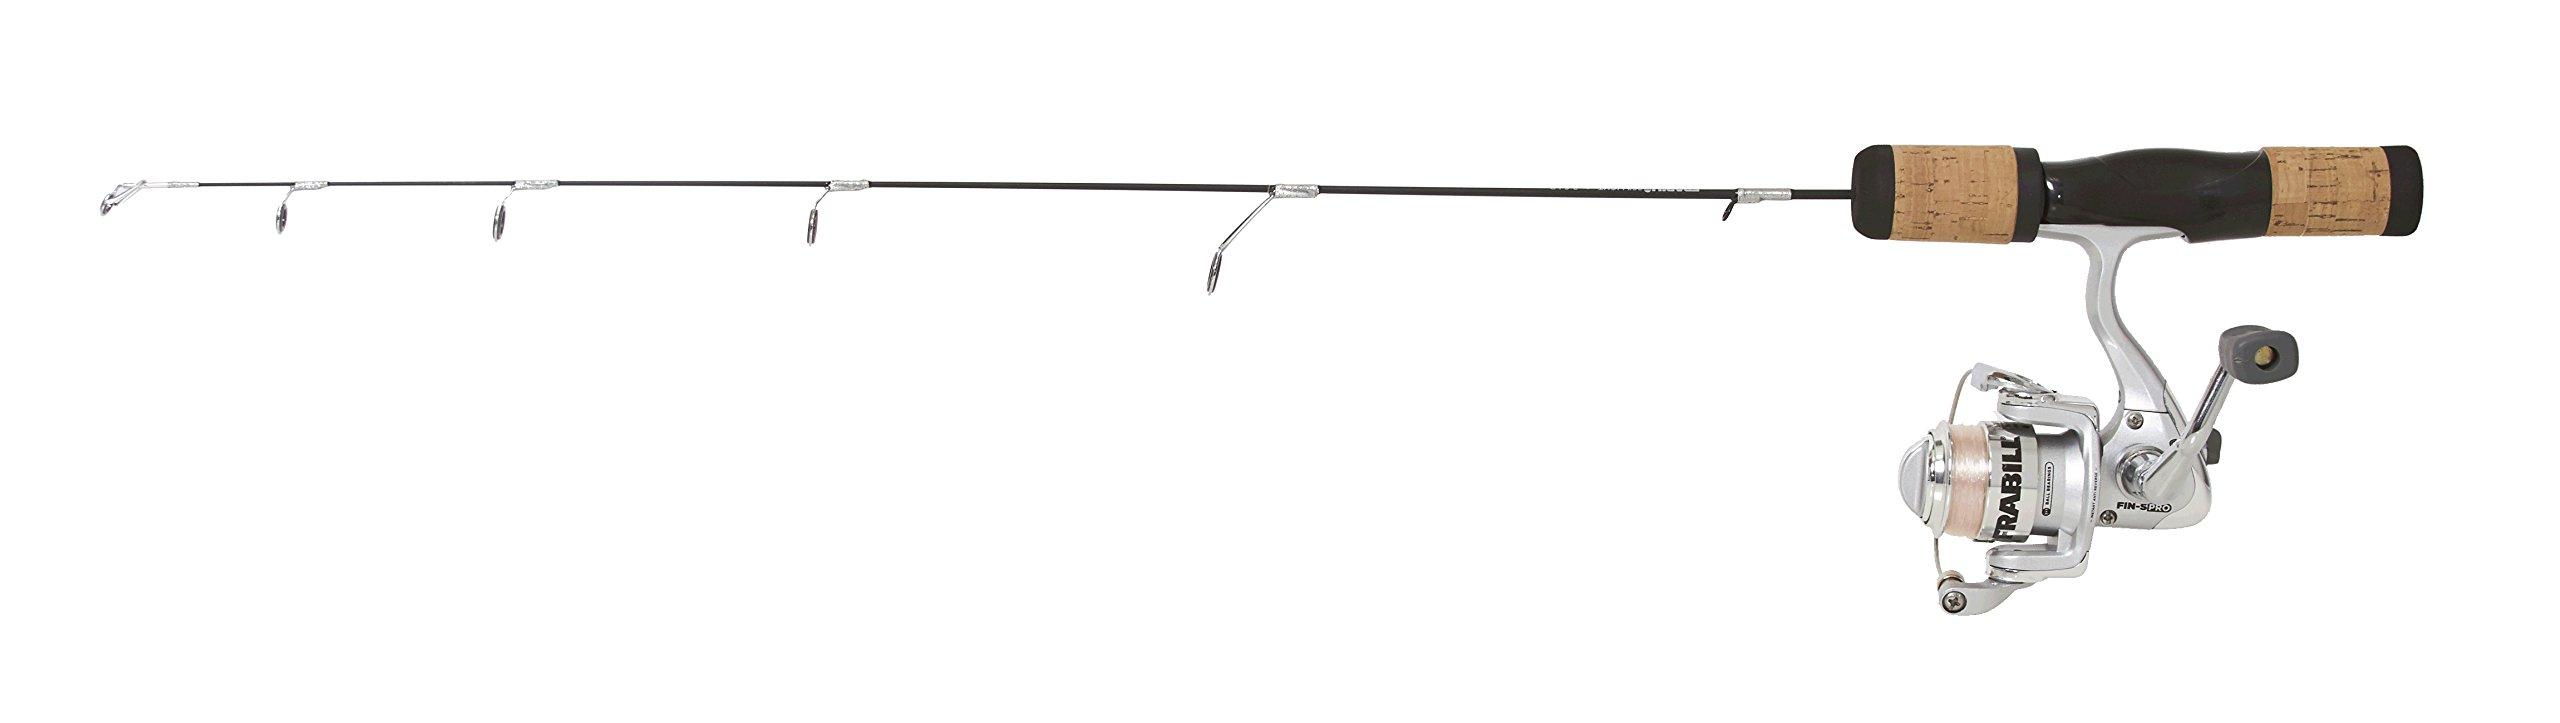 Frabill Fin-S Pro 24-Inch Ultra Light Ice Fishing Combo, Black